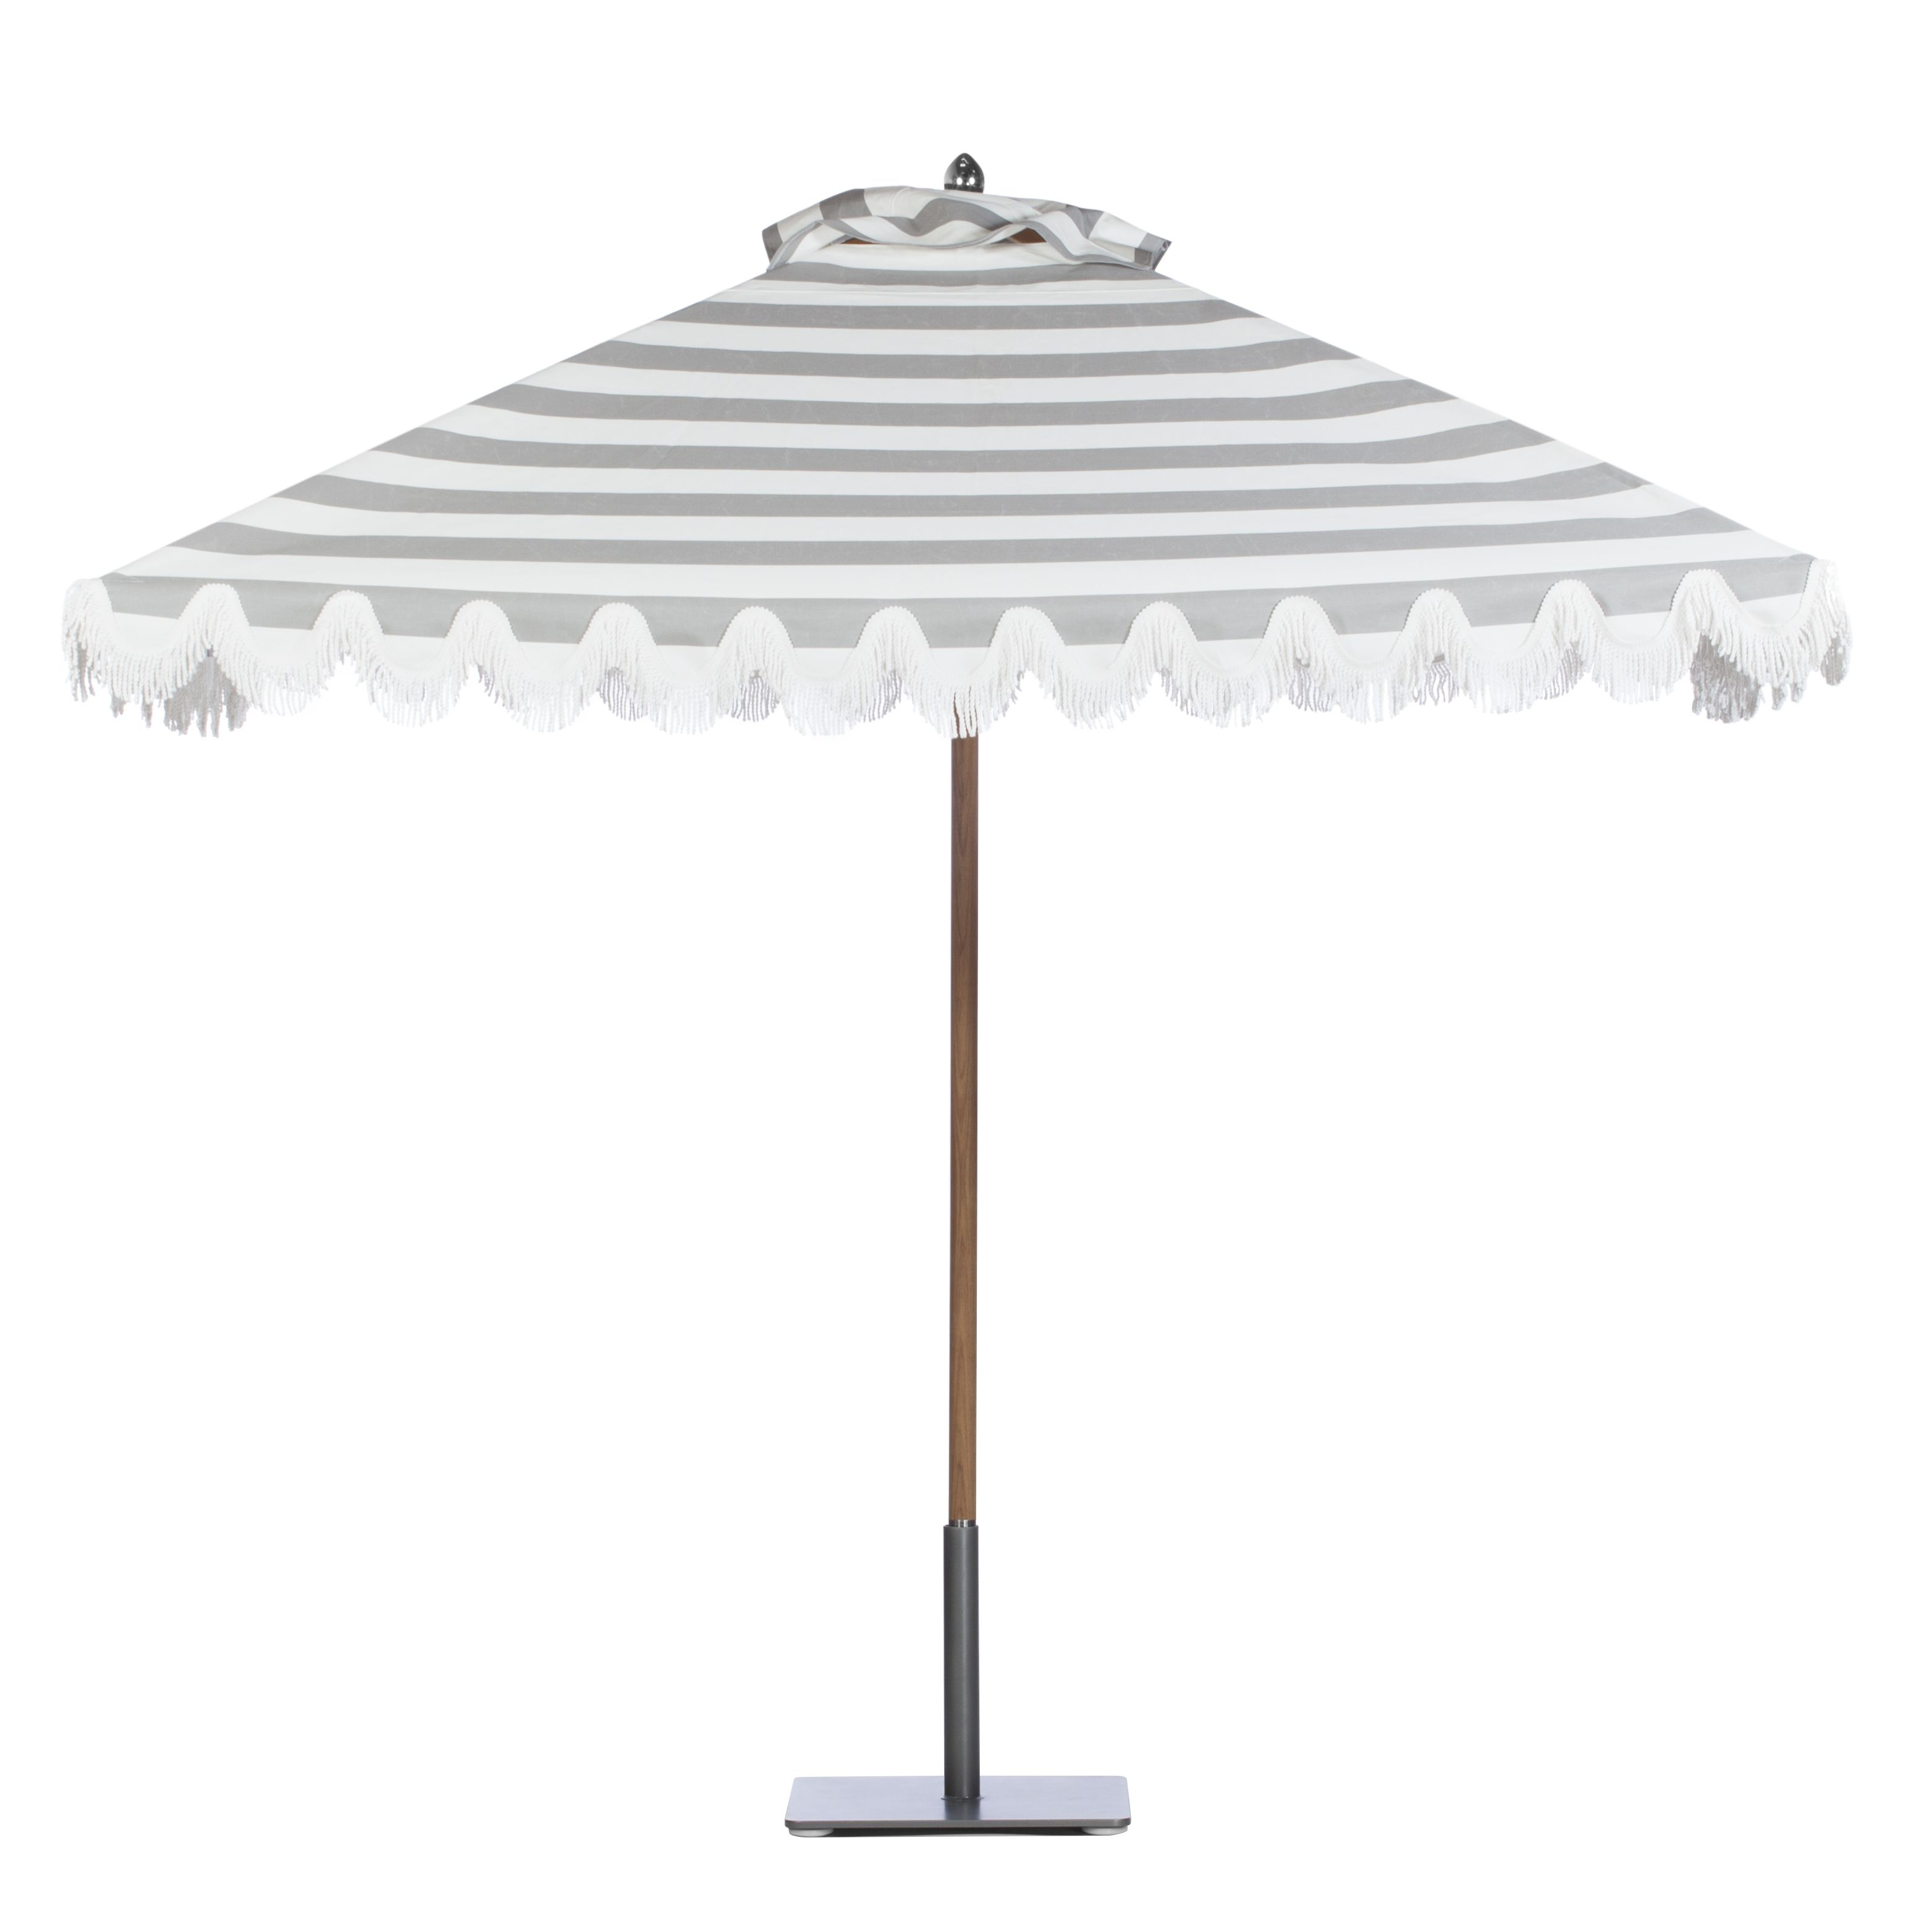 Riviera Umbrella In Teak With Regatta Cabana Grey Stripe Canopy